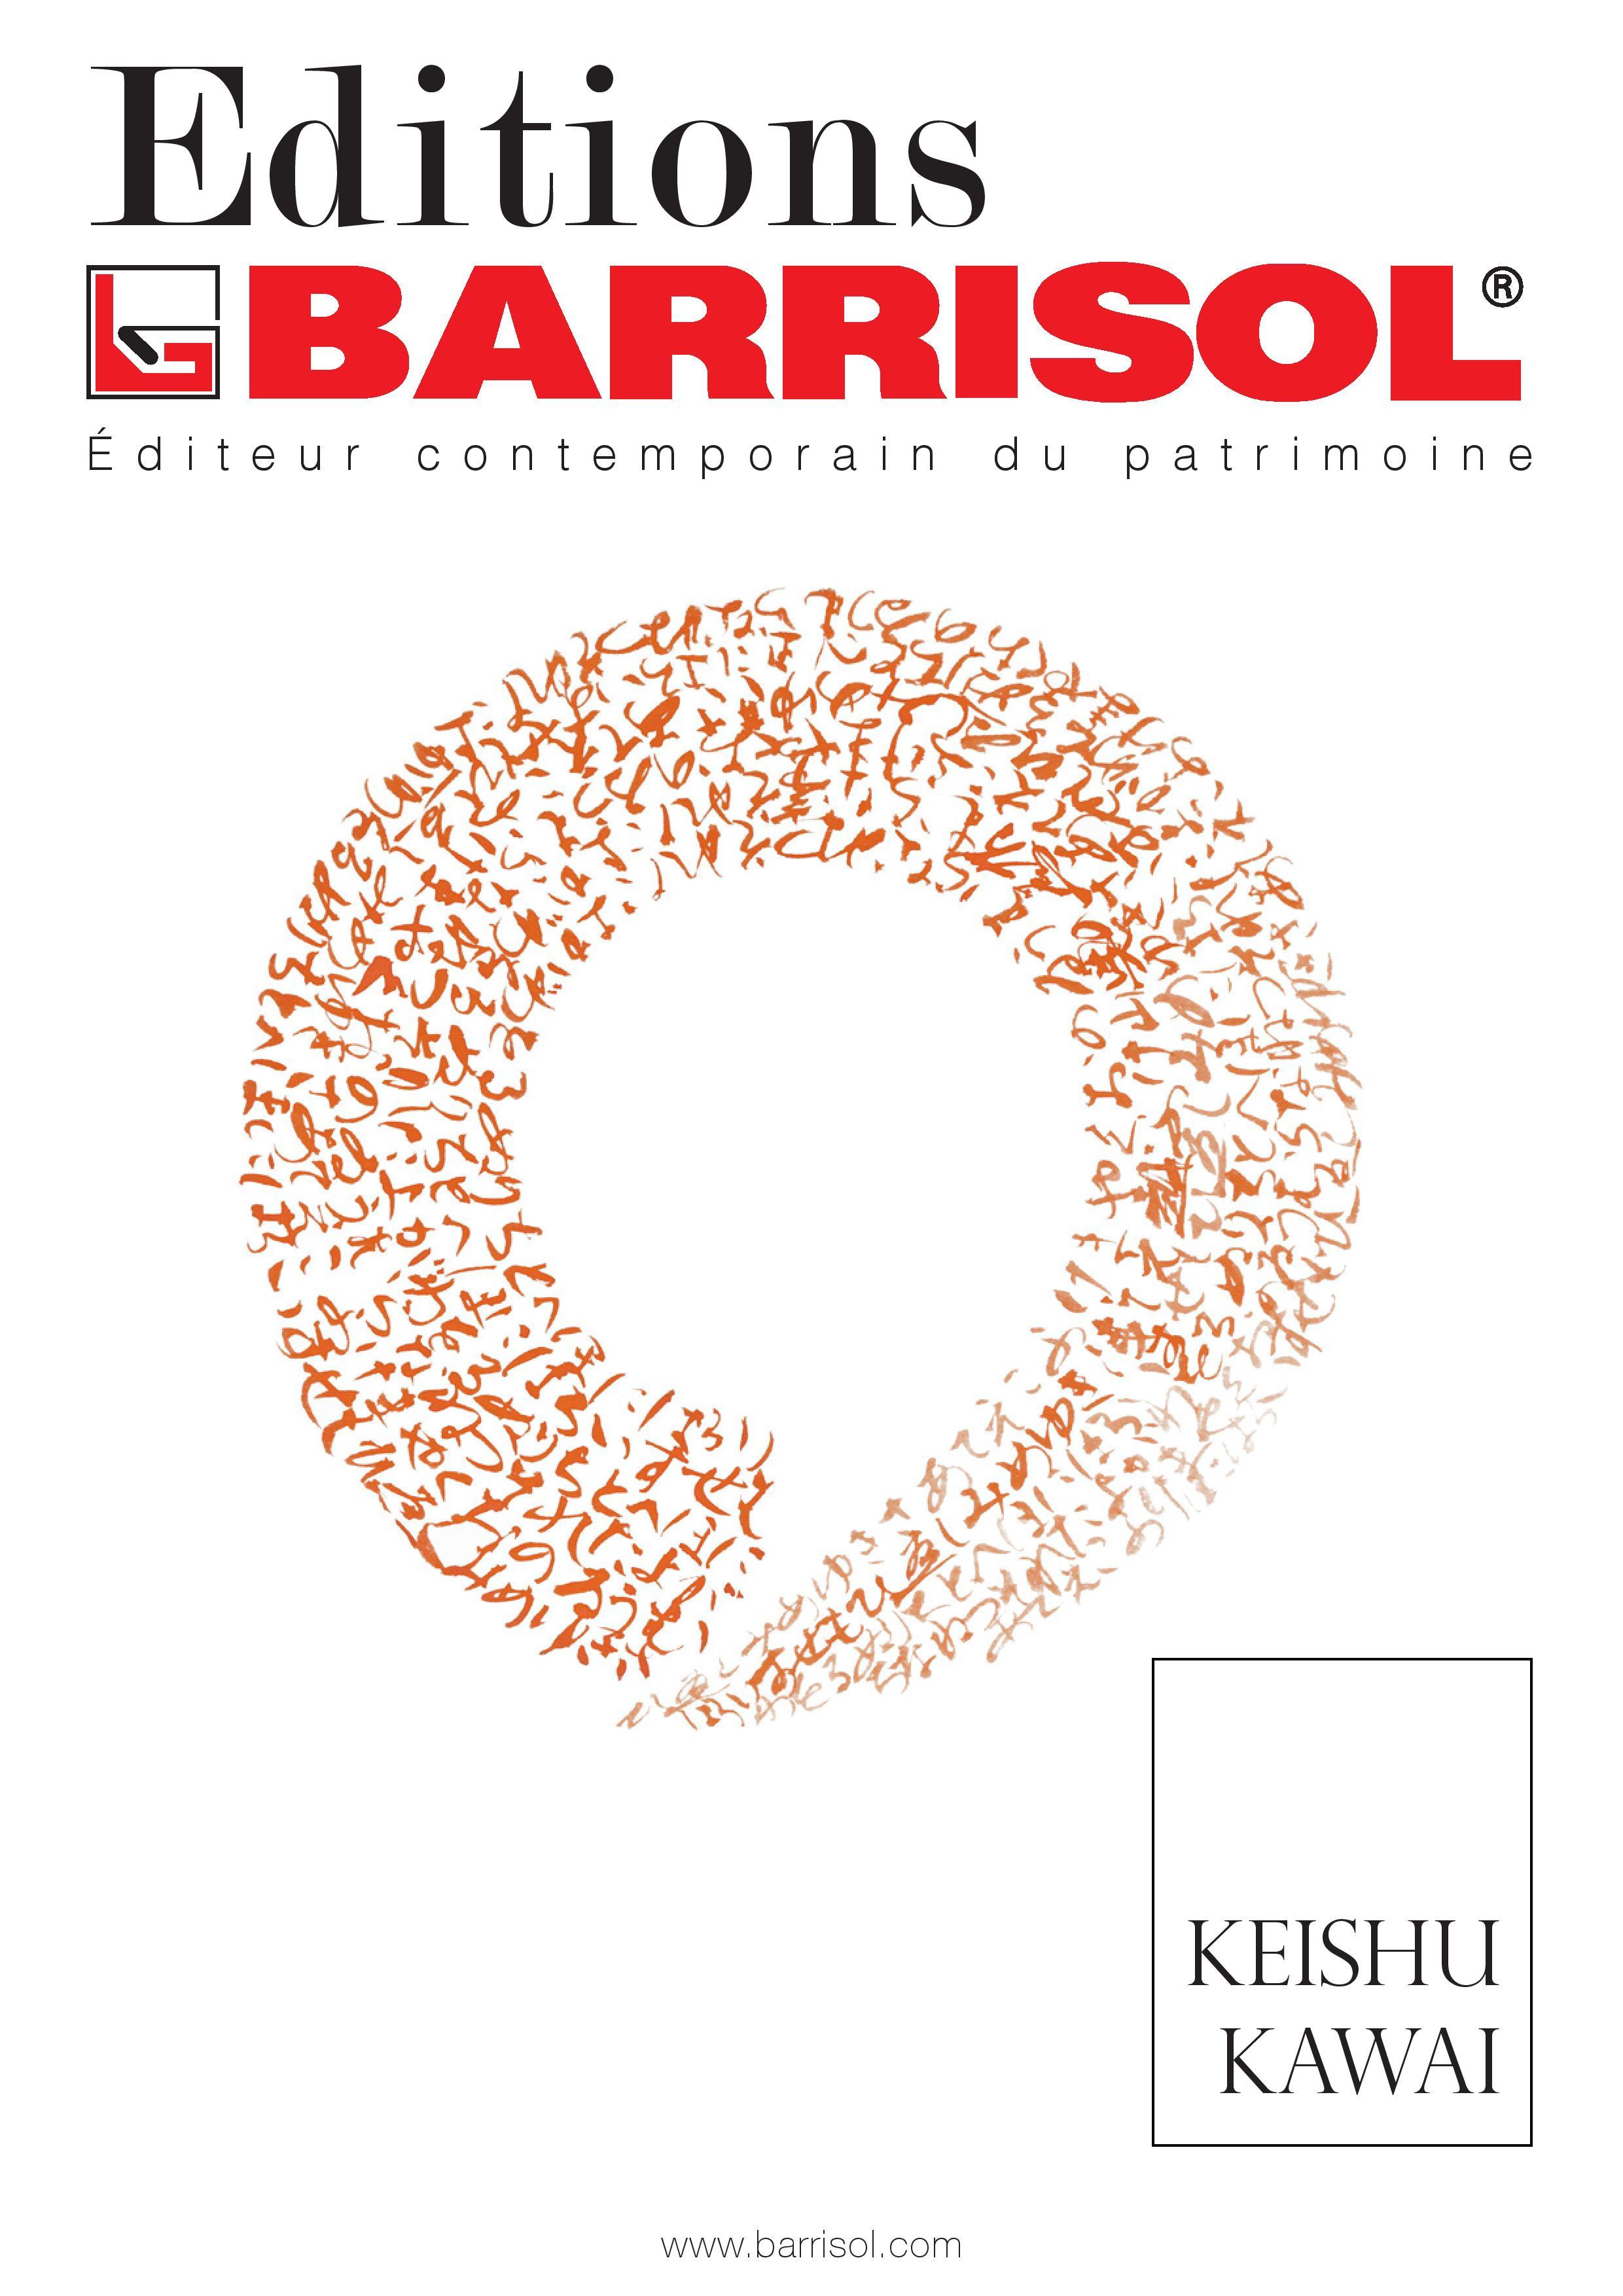 Editions BARRISOL - Katalog Keishu Kawai